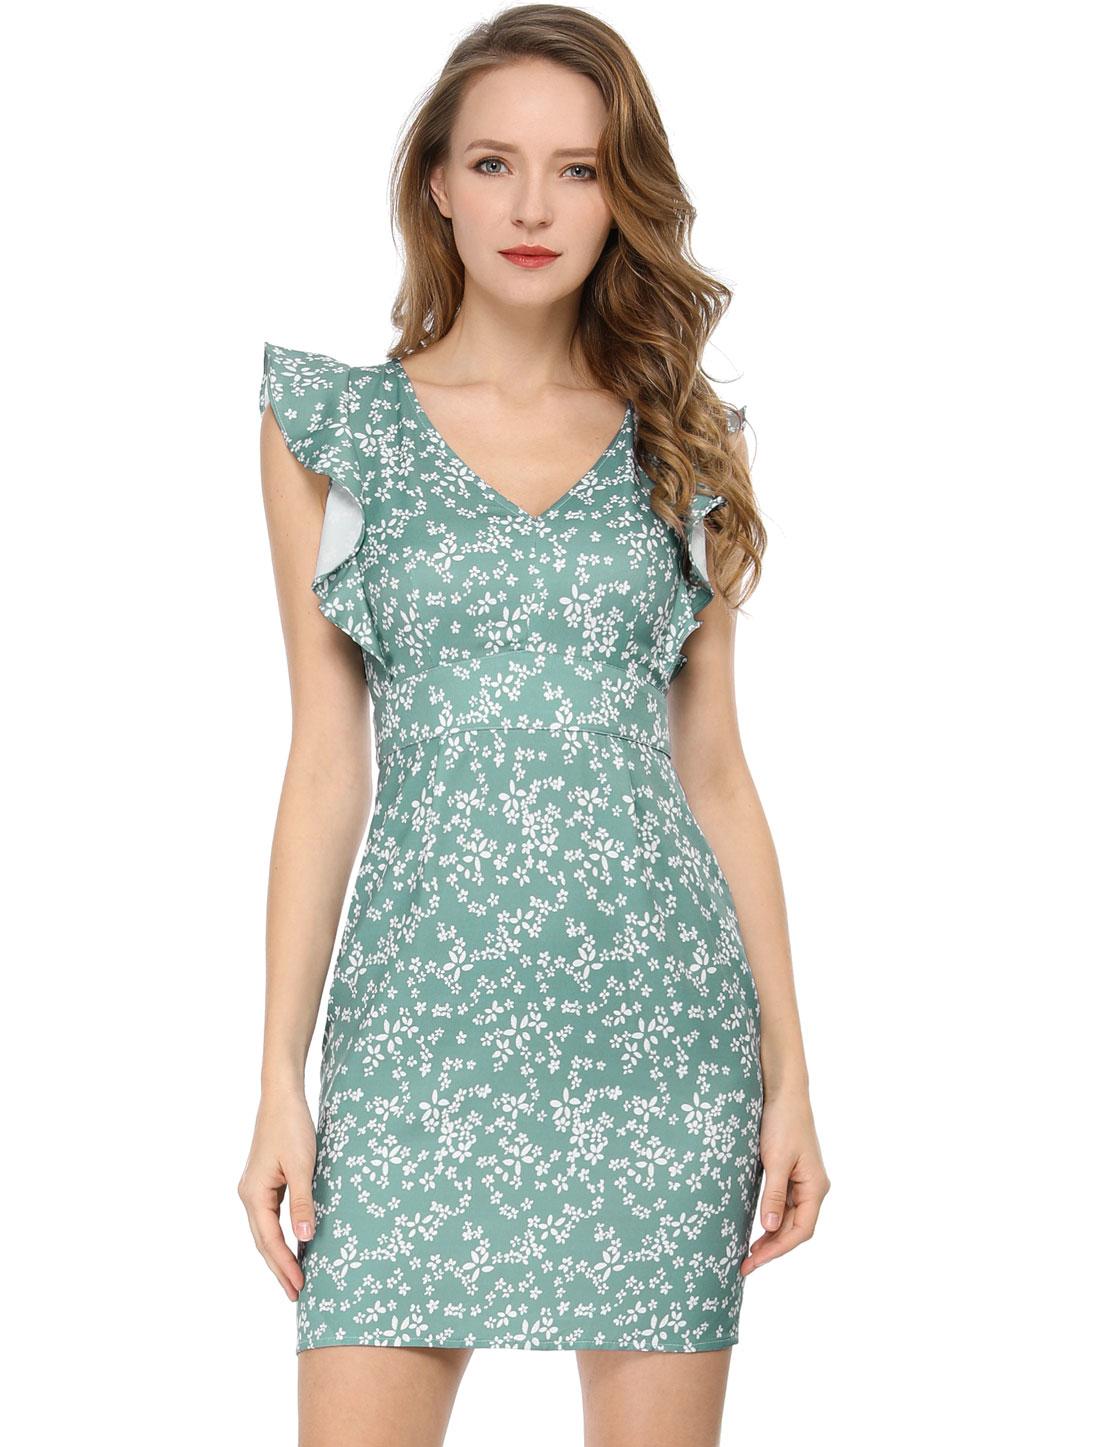 Allegra K Women's Floral Retro Ruffle Slim Bodycon Pencil Sheath Dress Green XS